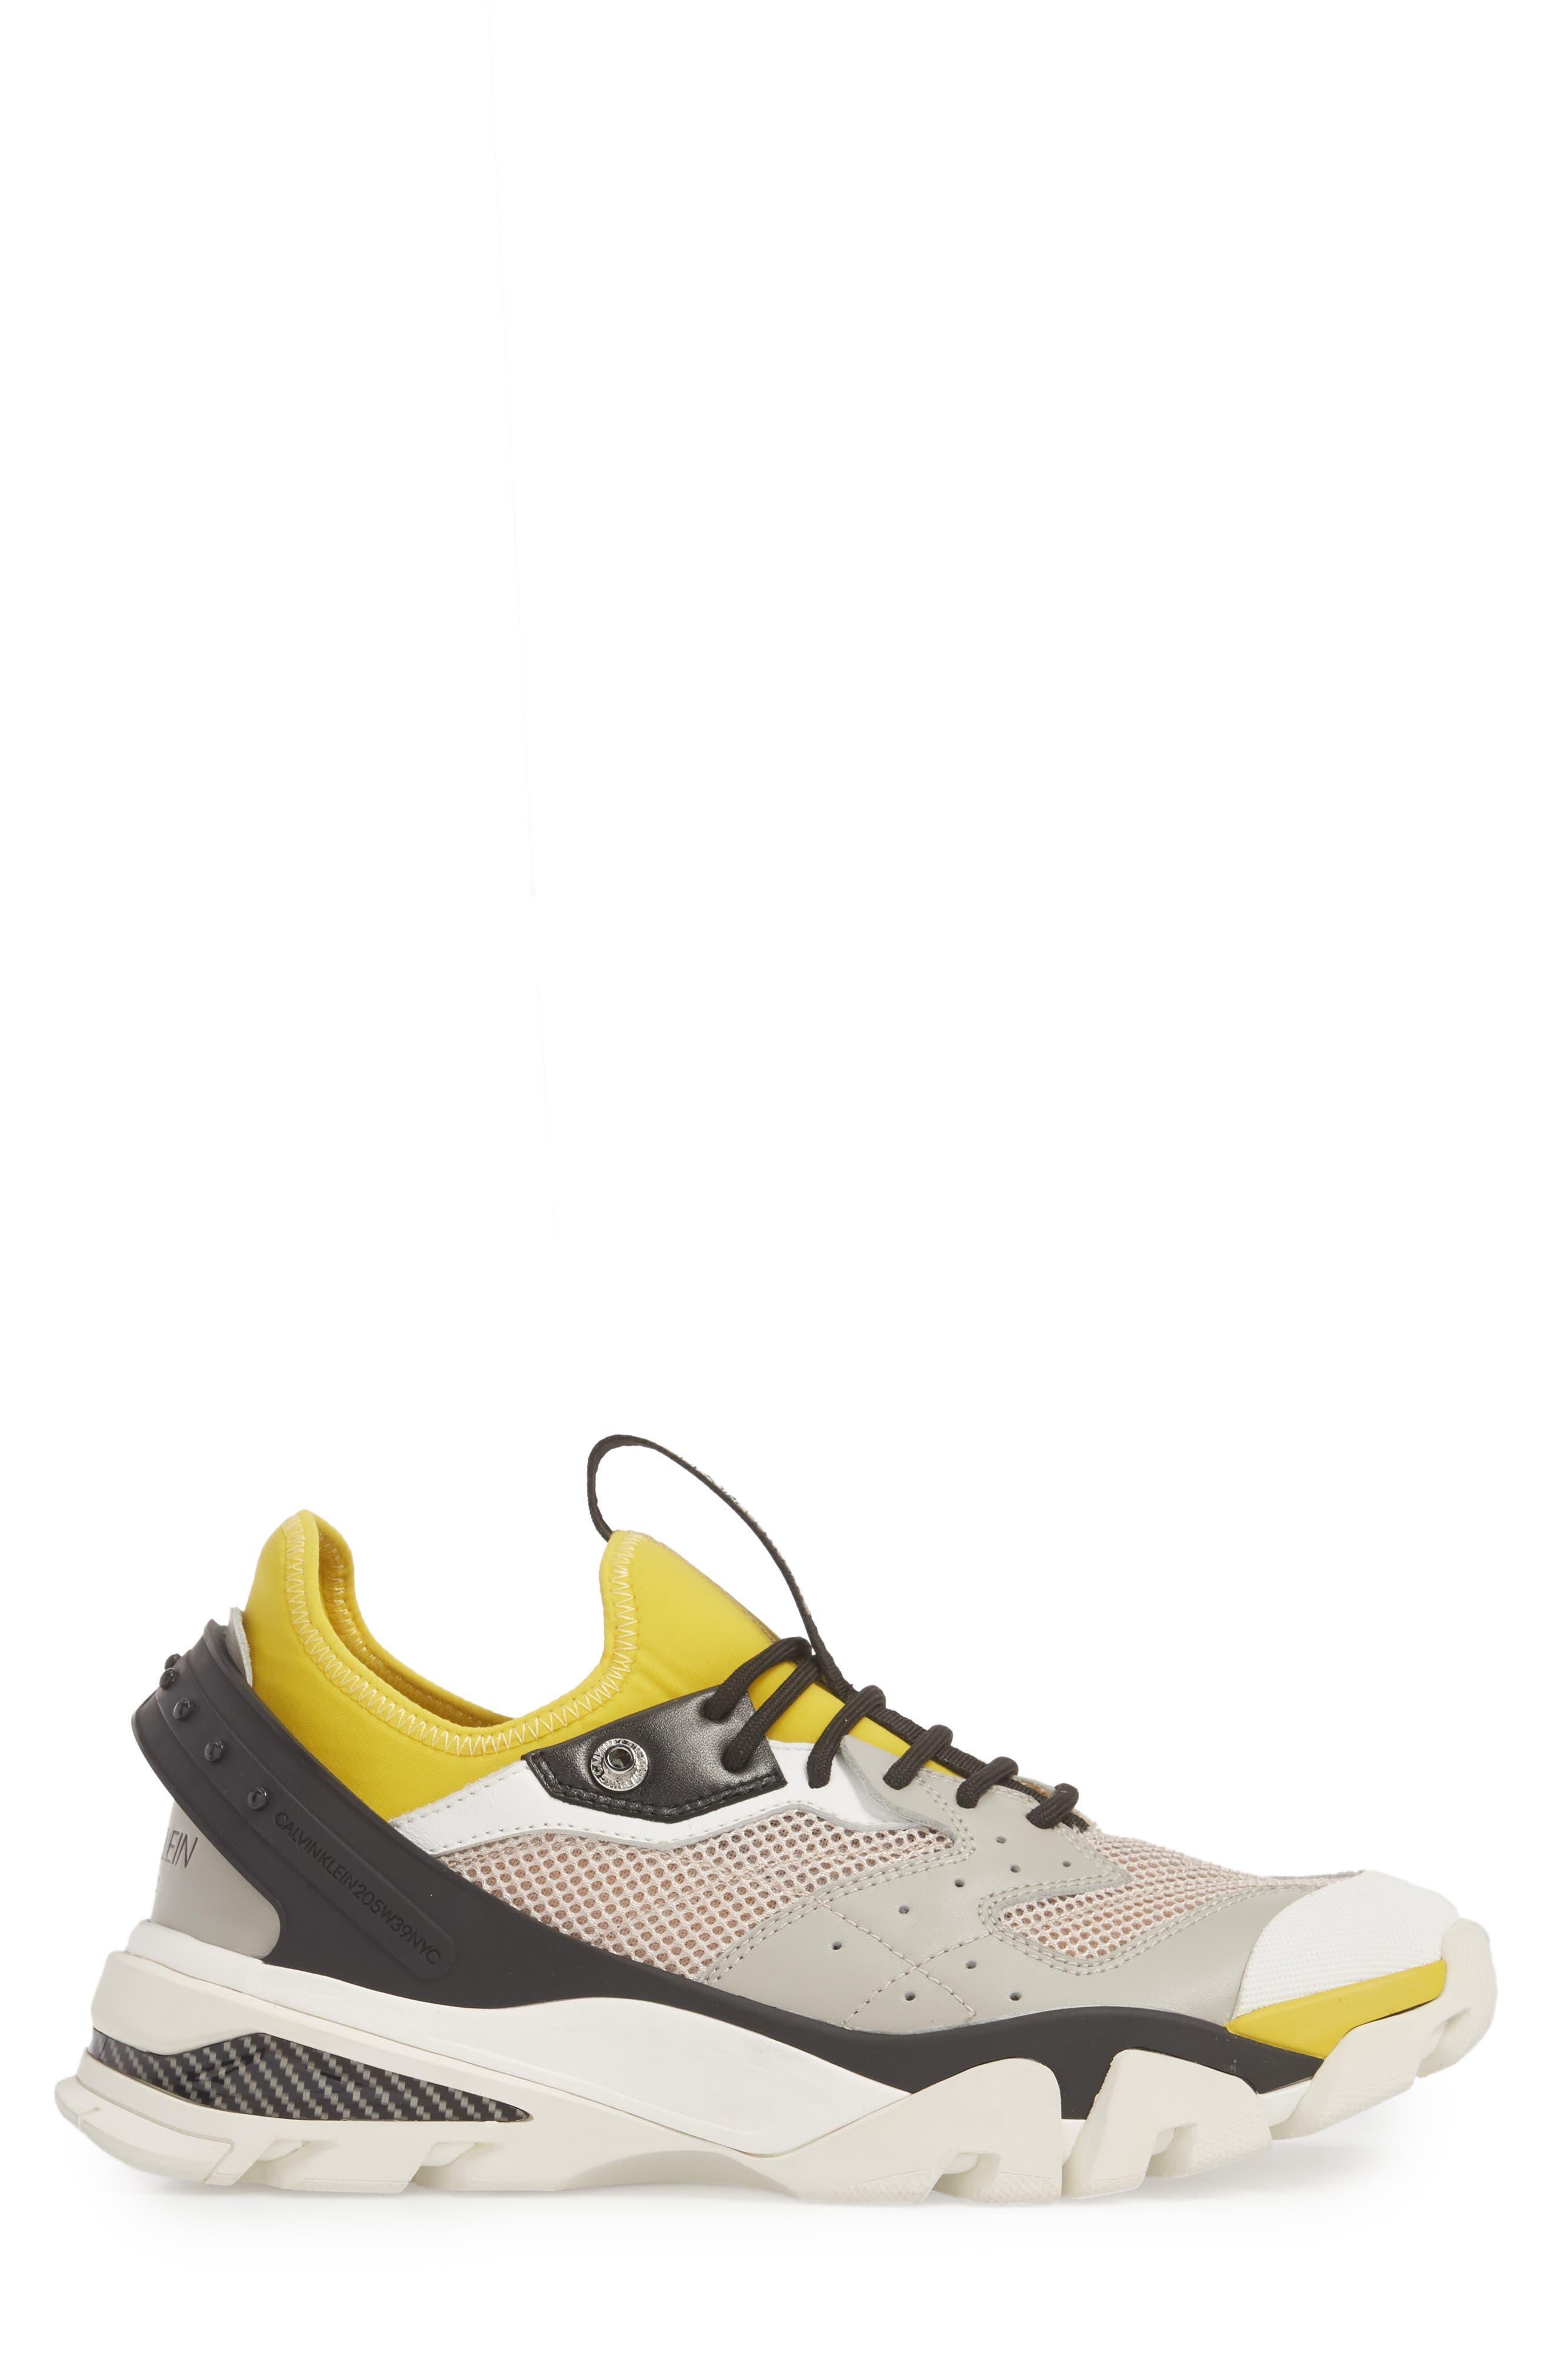 Carlos 10 Snapback Runner Sneaker,                             Alternate thumbnail 3, color,                             GREY/ YELLOW/ BLACK/ WHITE